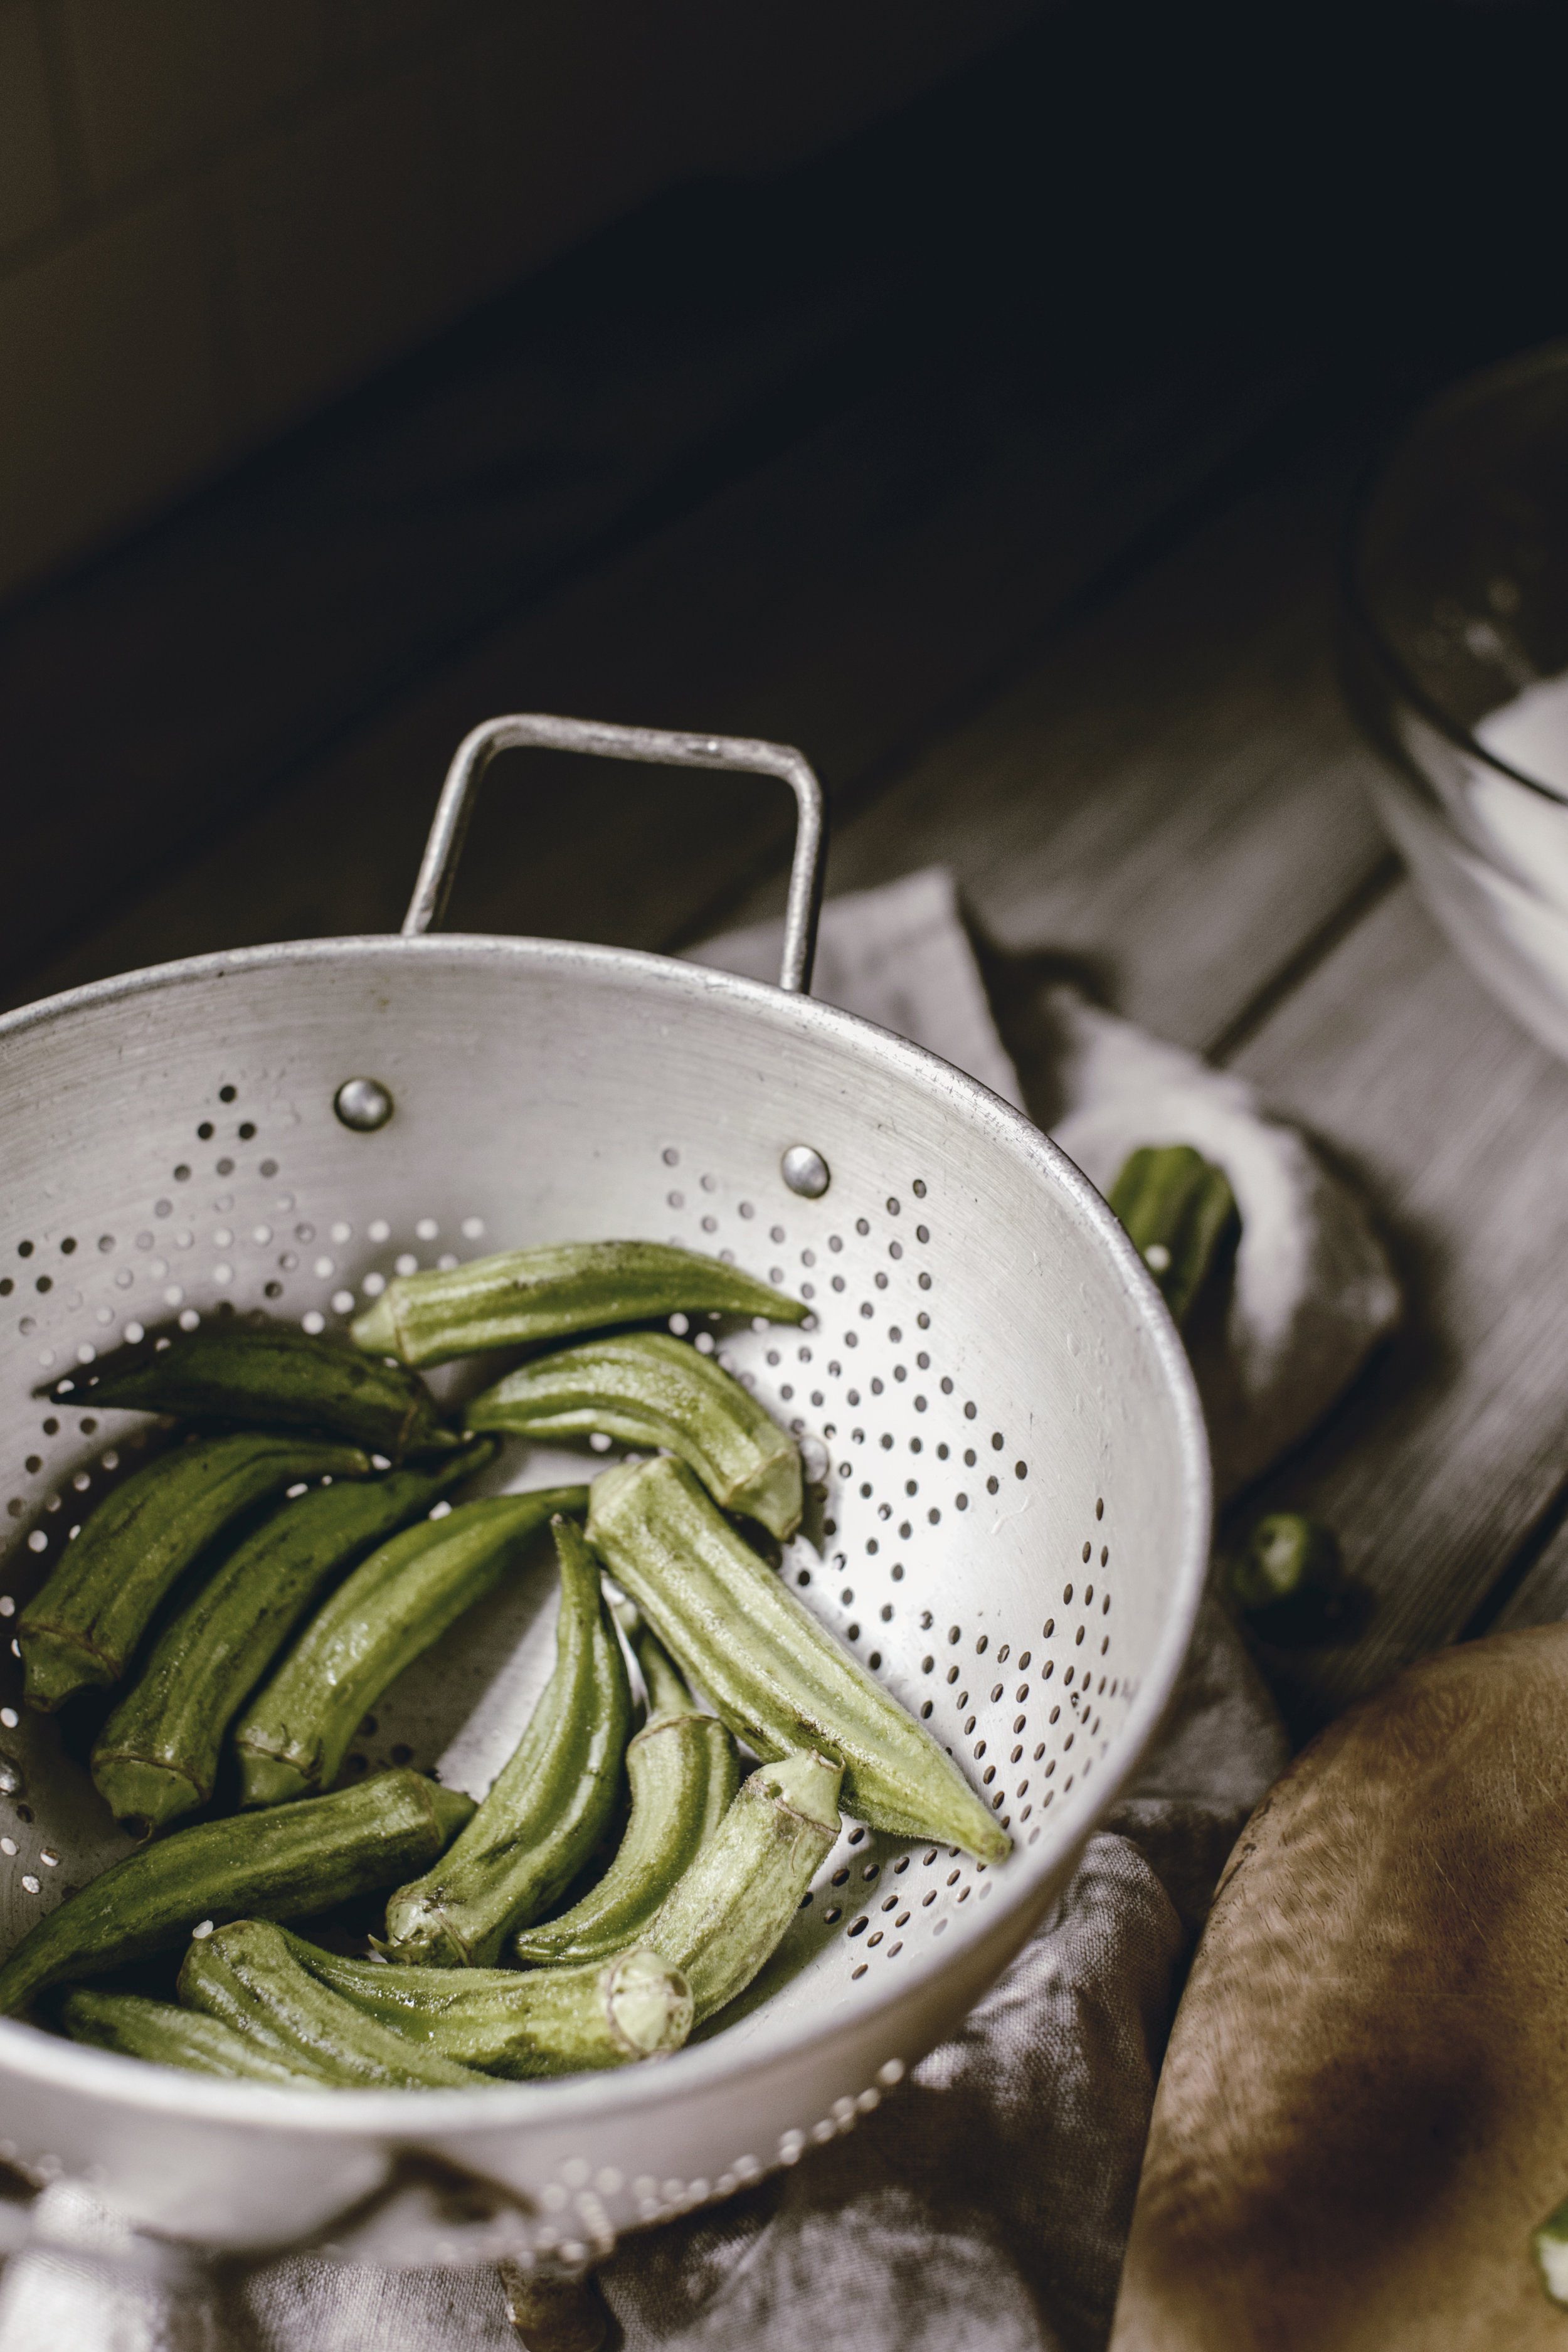 vintage colander with fresh okra / southern kitchen bucket list / heirloomed